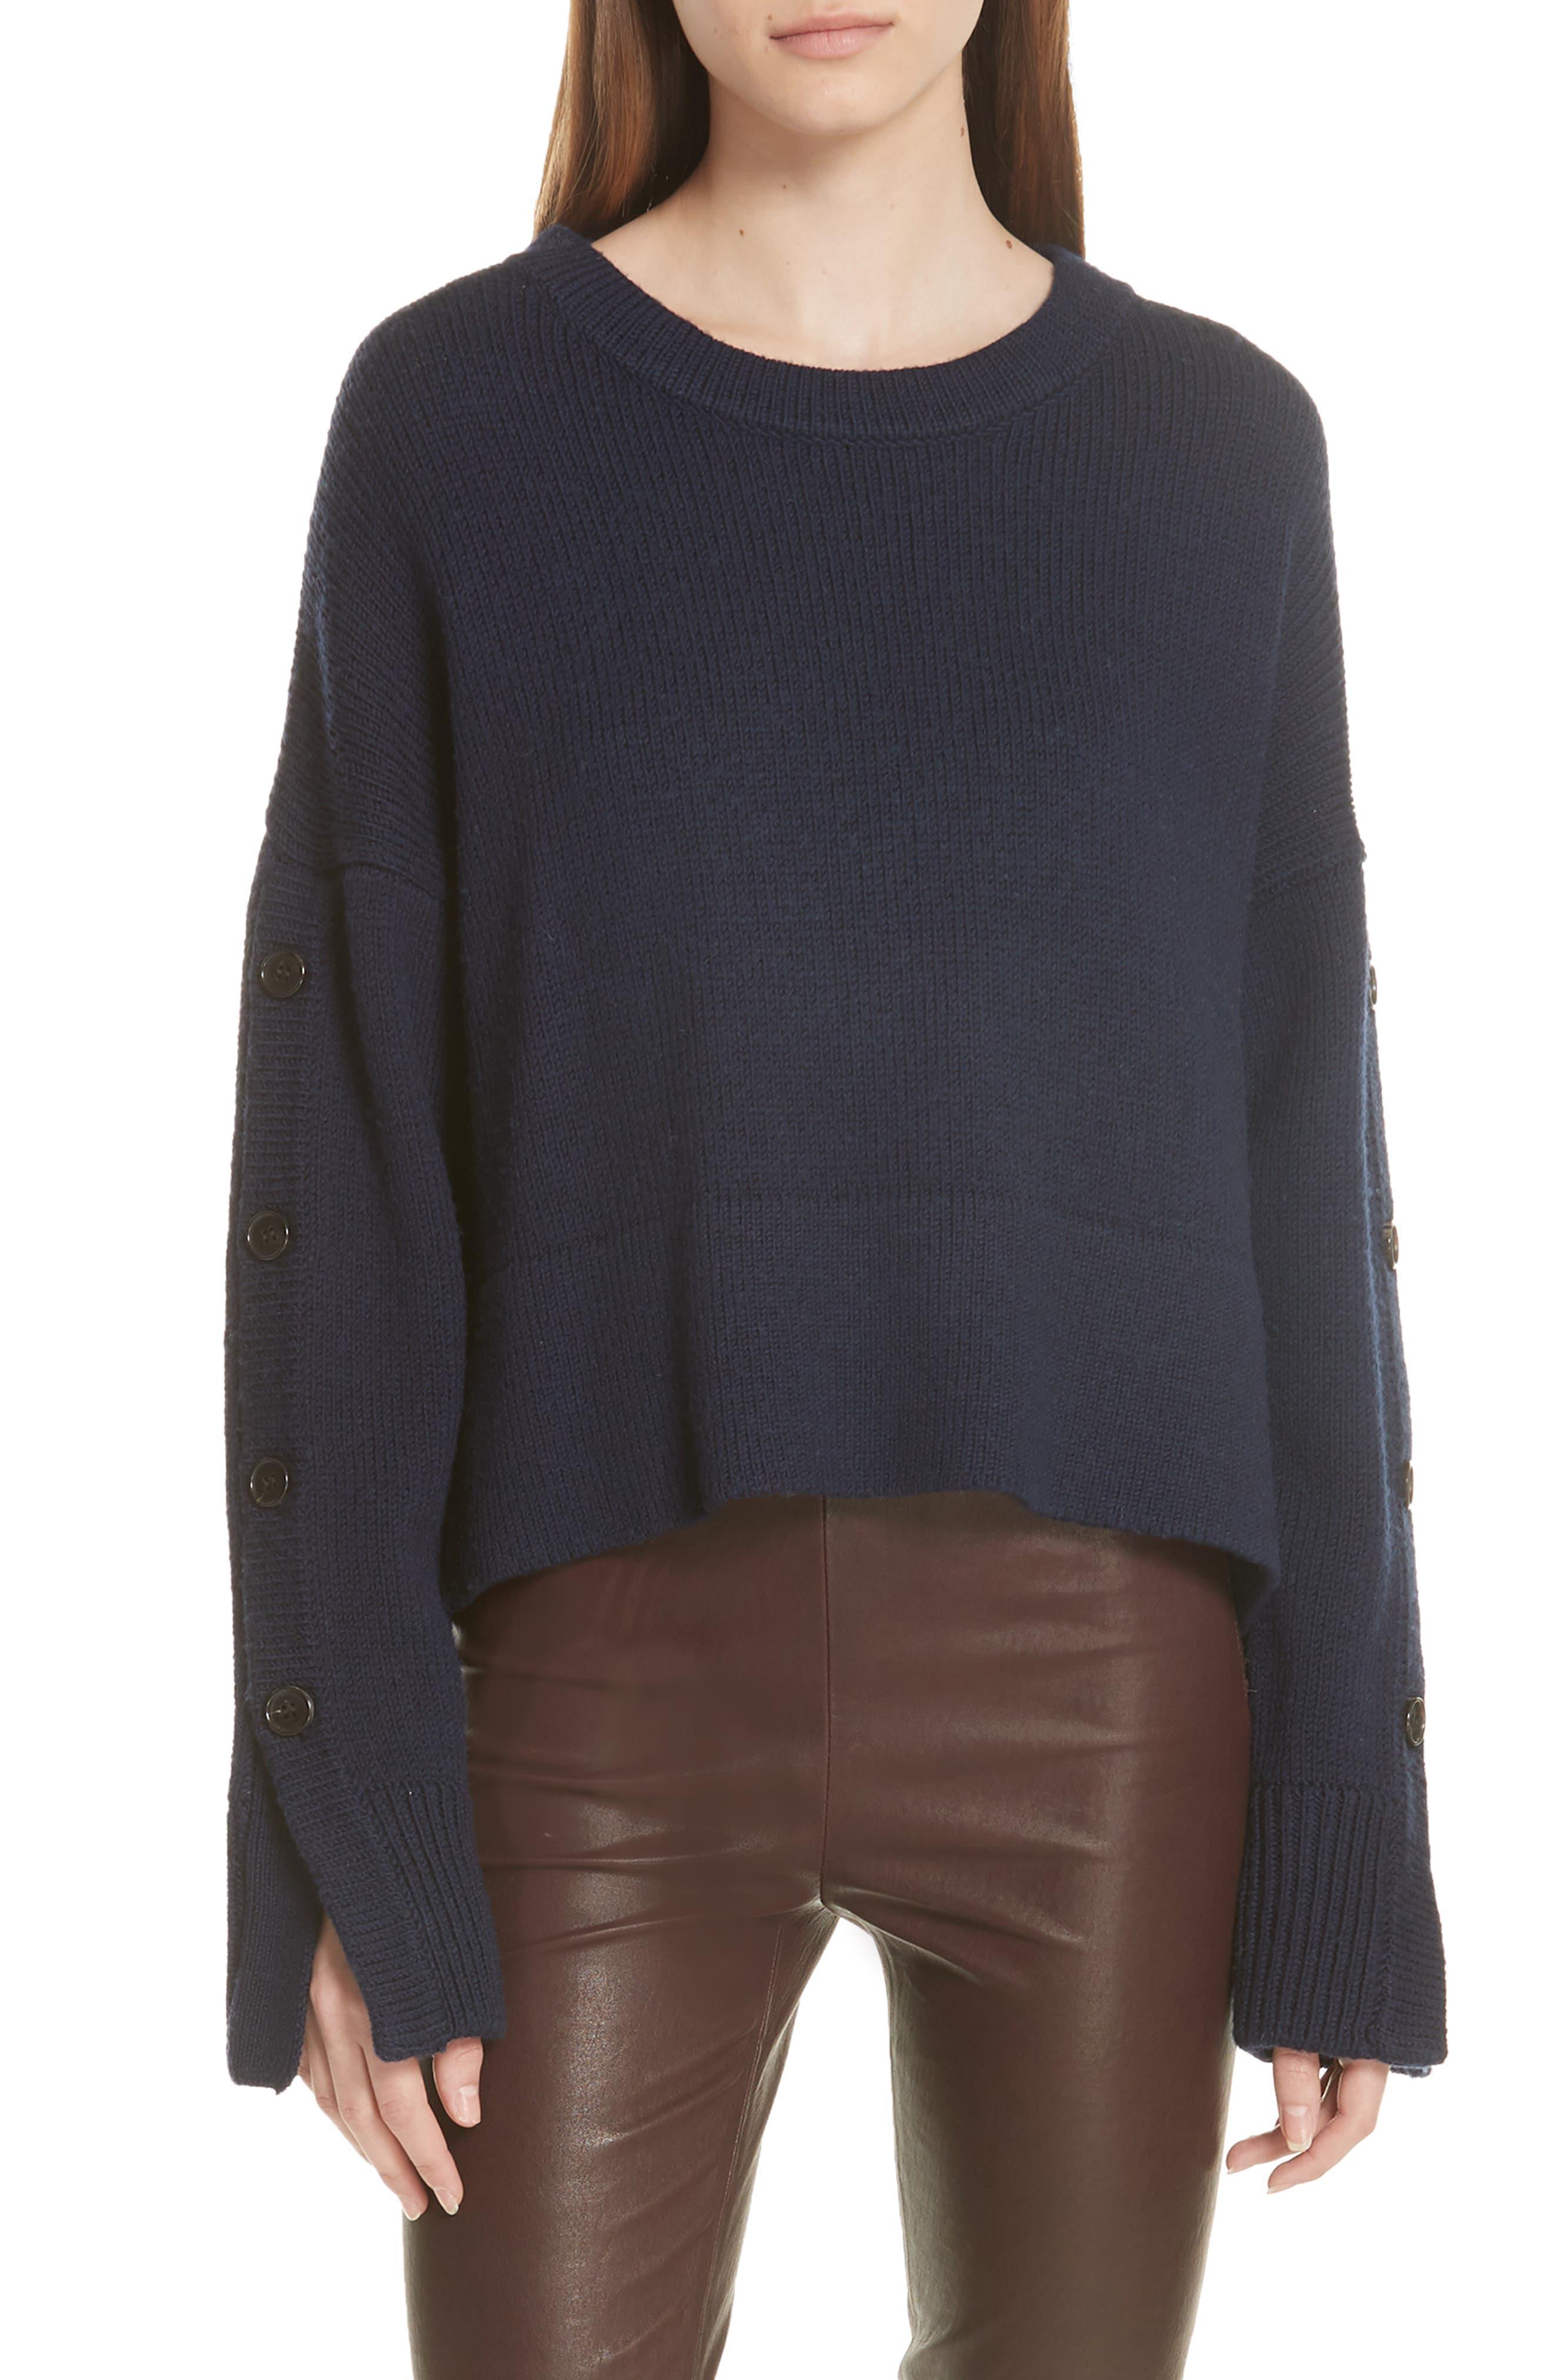 GREY JASON WU Aquila Button Sleeve Merino Wool Sweater in Dark Pine